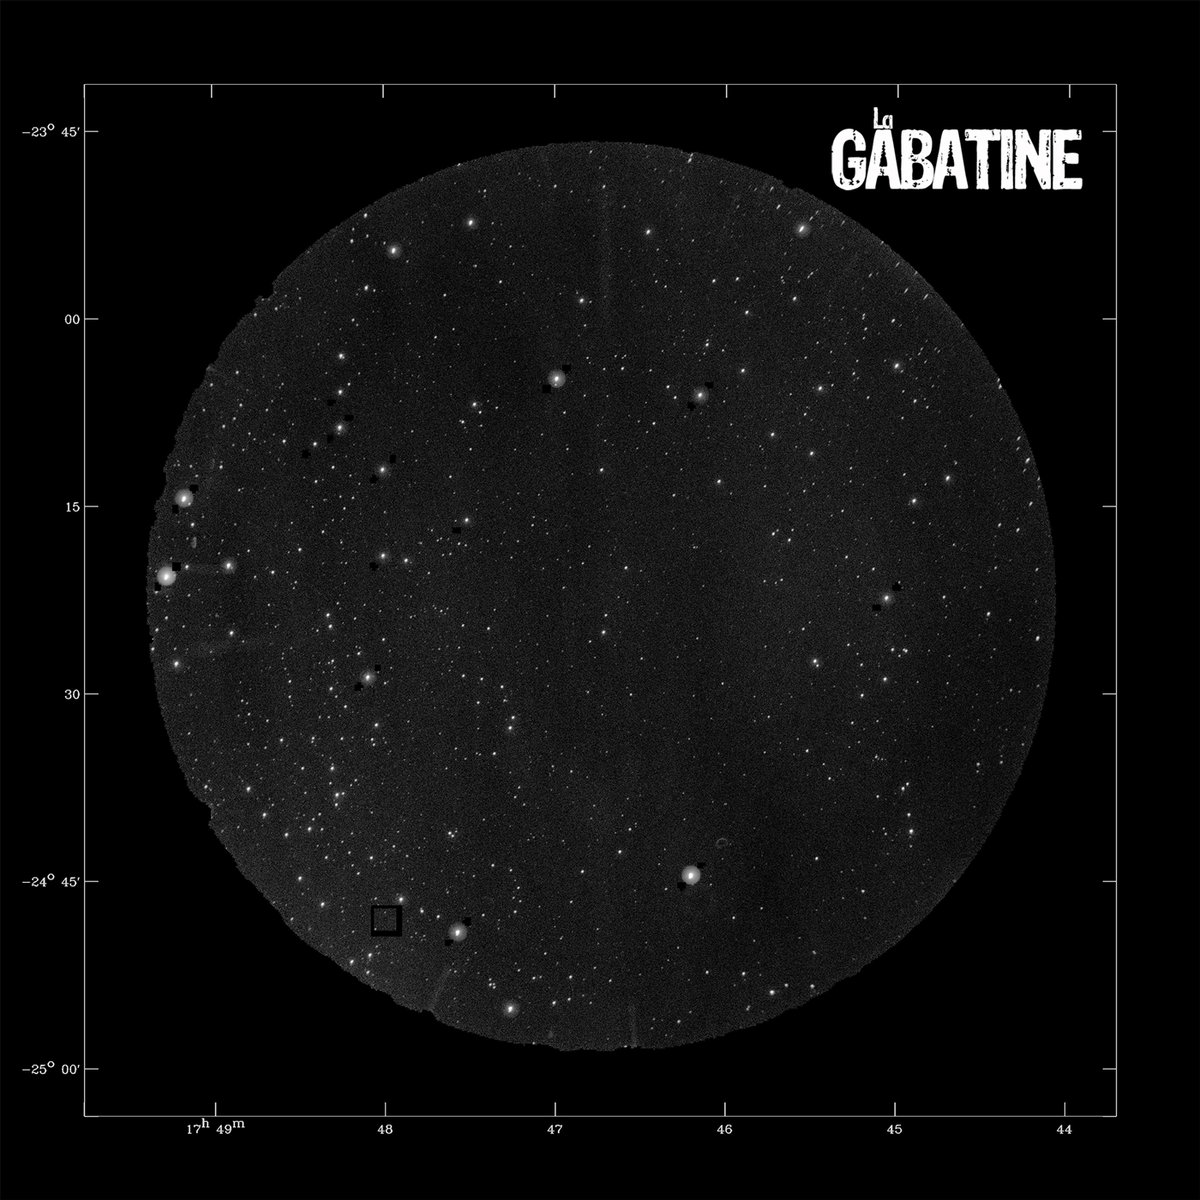 PSR J1748-2446ad | La Gabatine